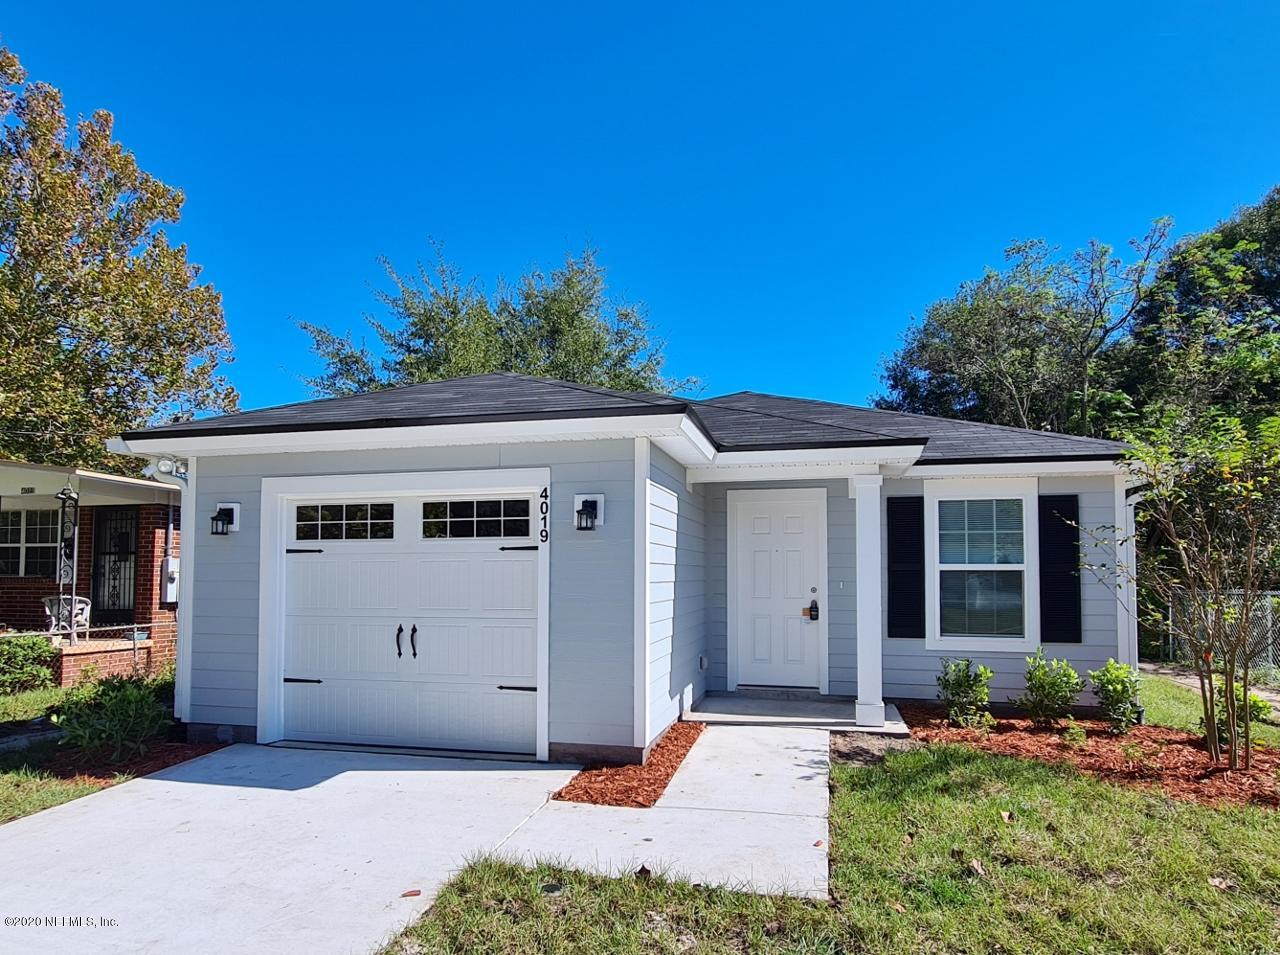 4019 MARLO, JACKSONVILLE, FLORIDA 32209, 3 Bedrooms Bedrooms, ,2 BathroomsBathrooms,Rental,For Rent,MARLO,1081587